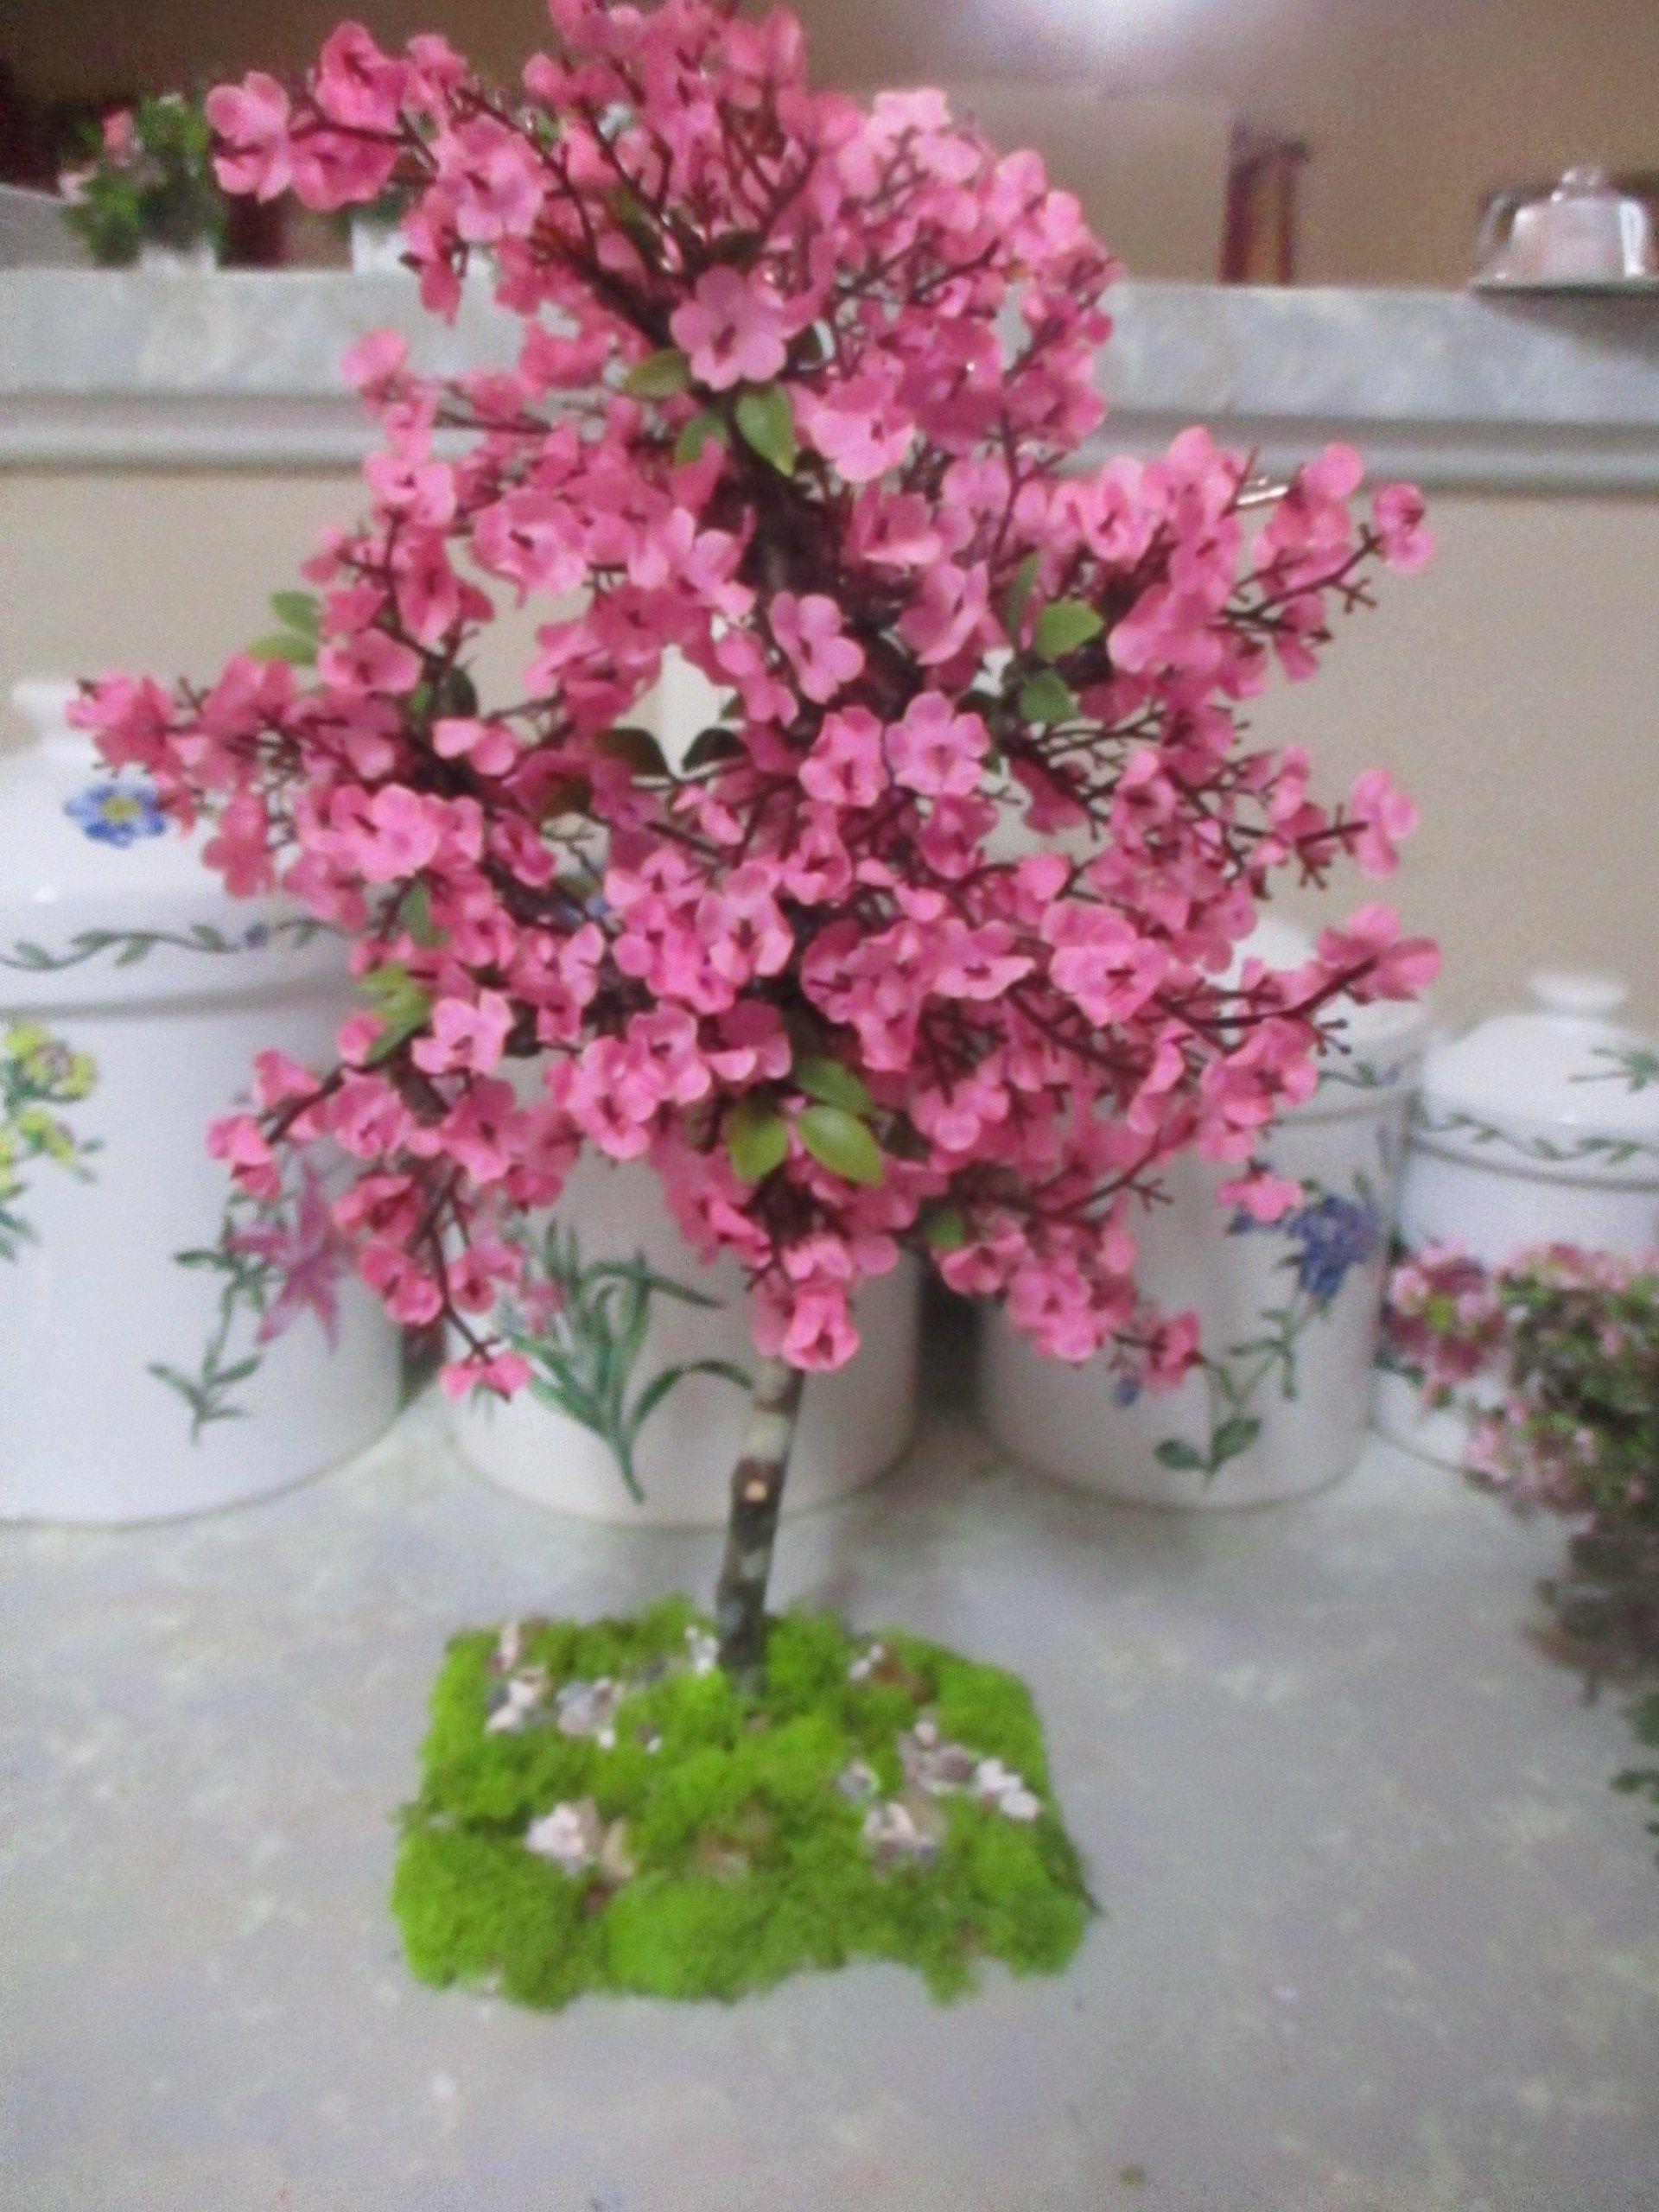 Ooak Miniature 13 1 2h Large Doll Dollhouse Japanese Etsy In 2021 Cherry Blossom Tree Japanese Cherry Blossom Blossom Trees